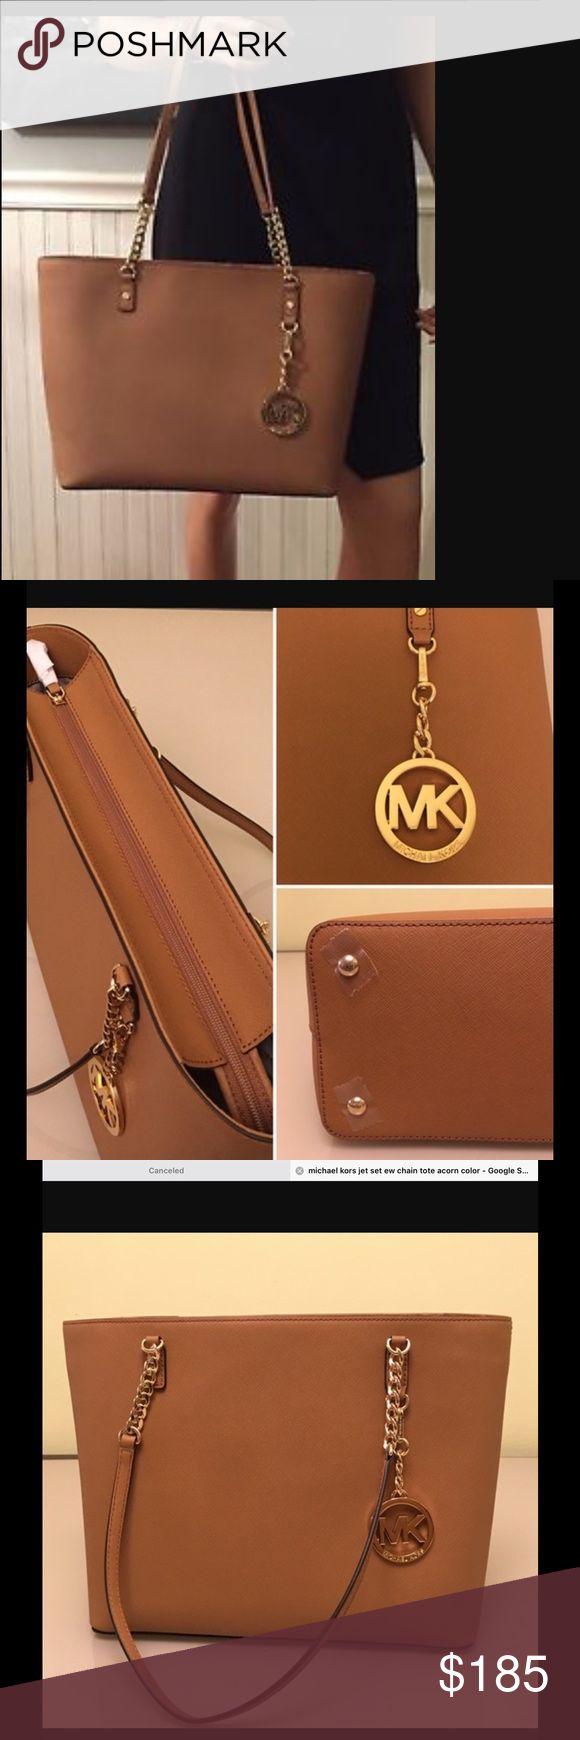 New Michael Kors ACORN COLOR BAG ⬇⬇ price dropped Bundle up and save Michael Kors Bags Shoulder Bags